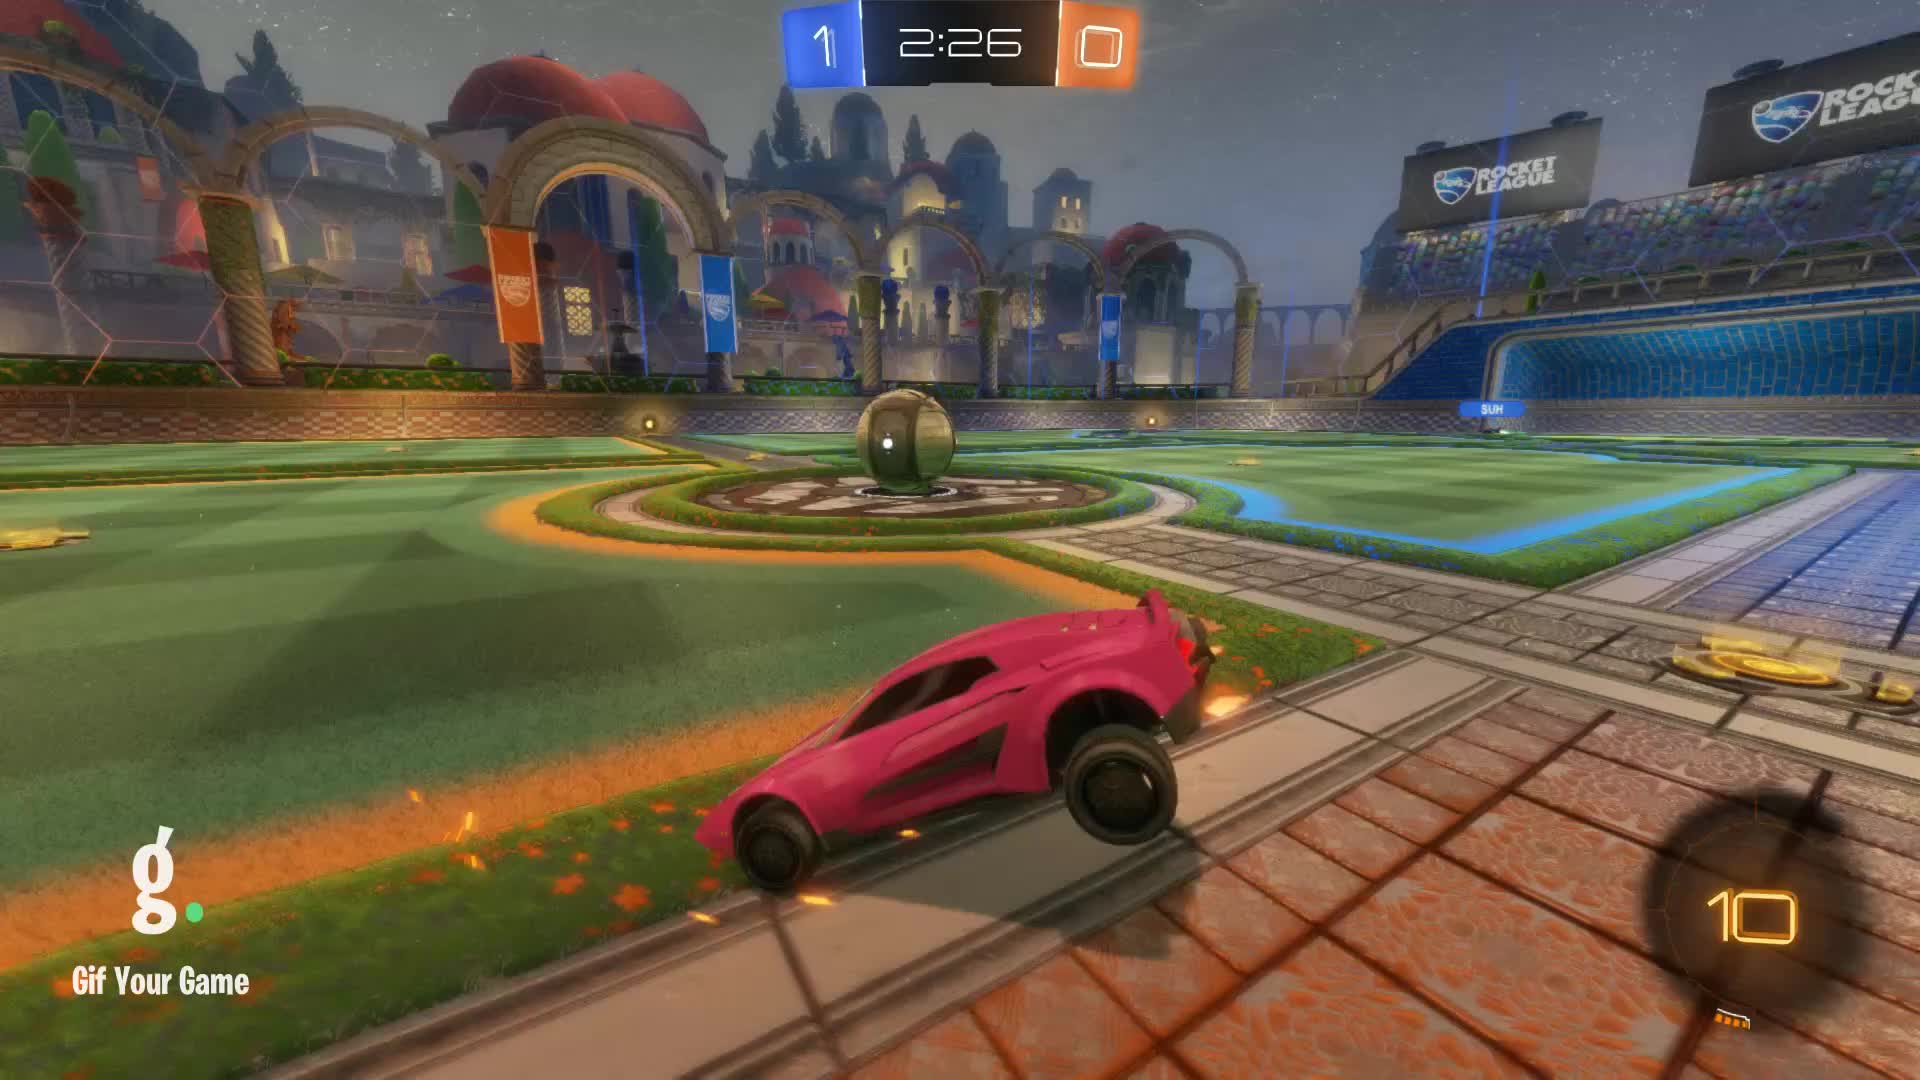 Gif Your Game, GifYourGame, Goal, Rocket League, RocketLeague, dem, Goal 2: dem GIFs